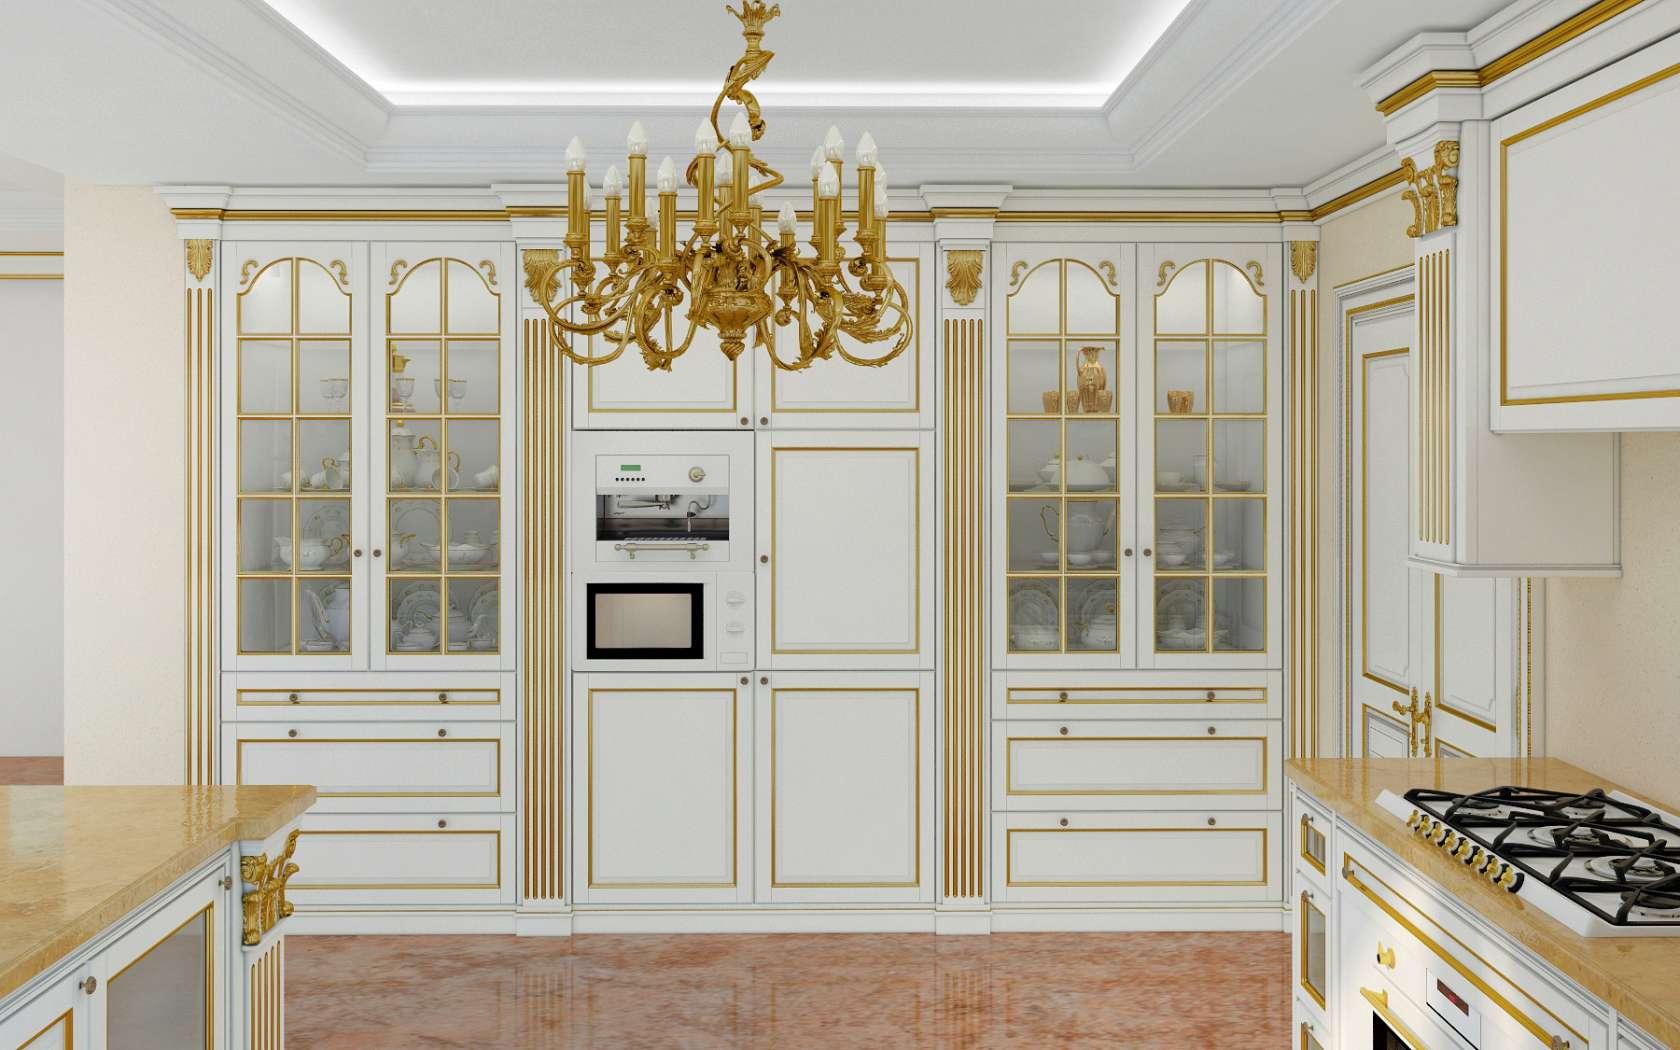 Cucine Di Lusso. Photo Gallery Of The Boiserie Di Lusso Cucine ...